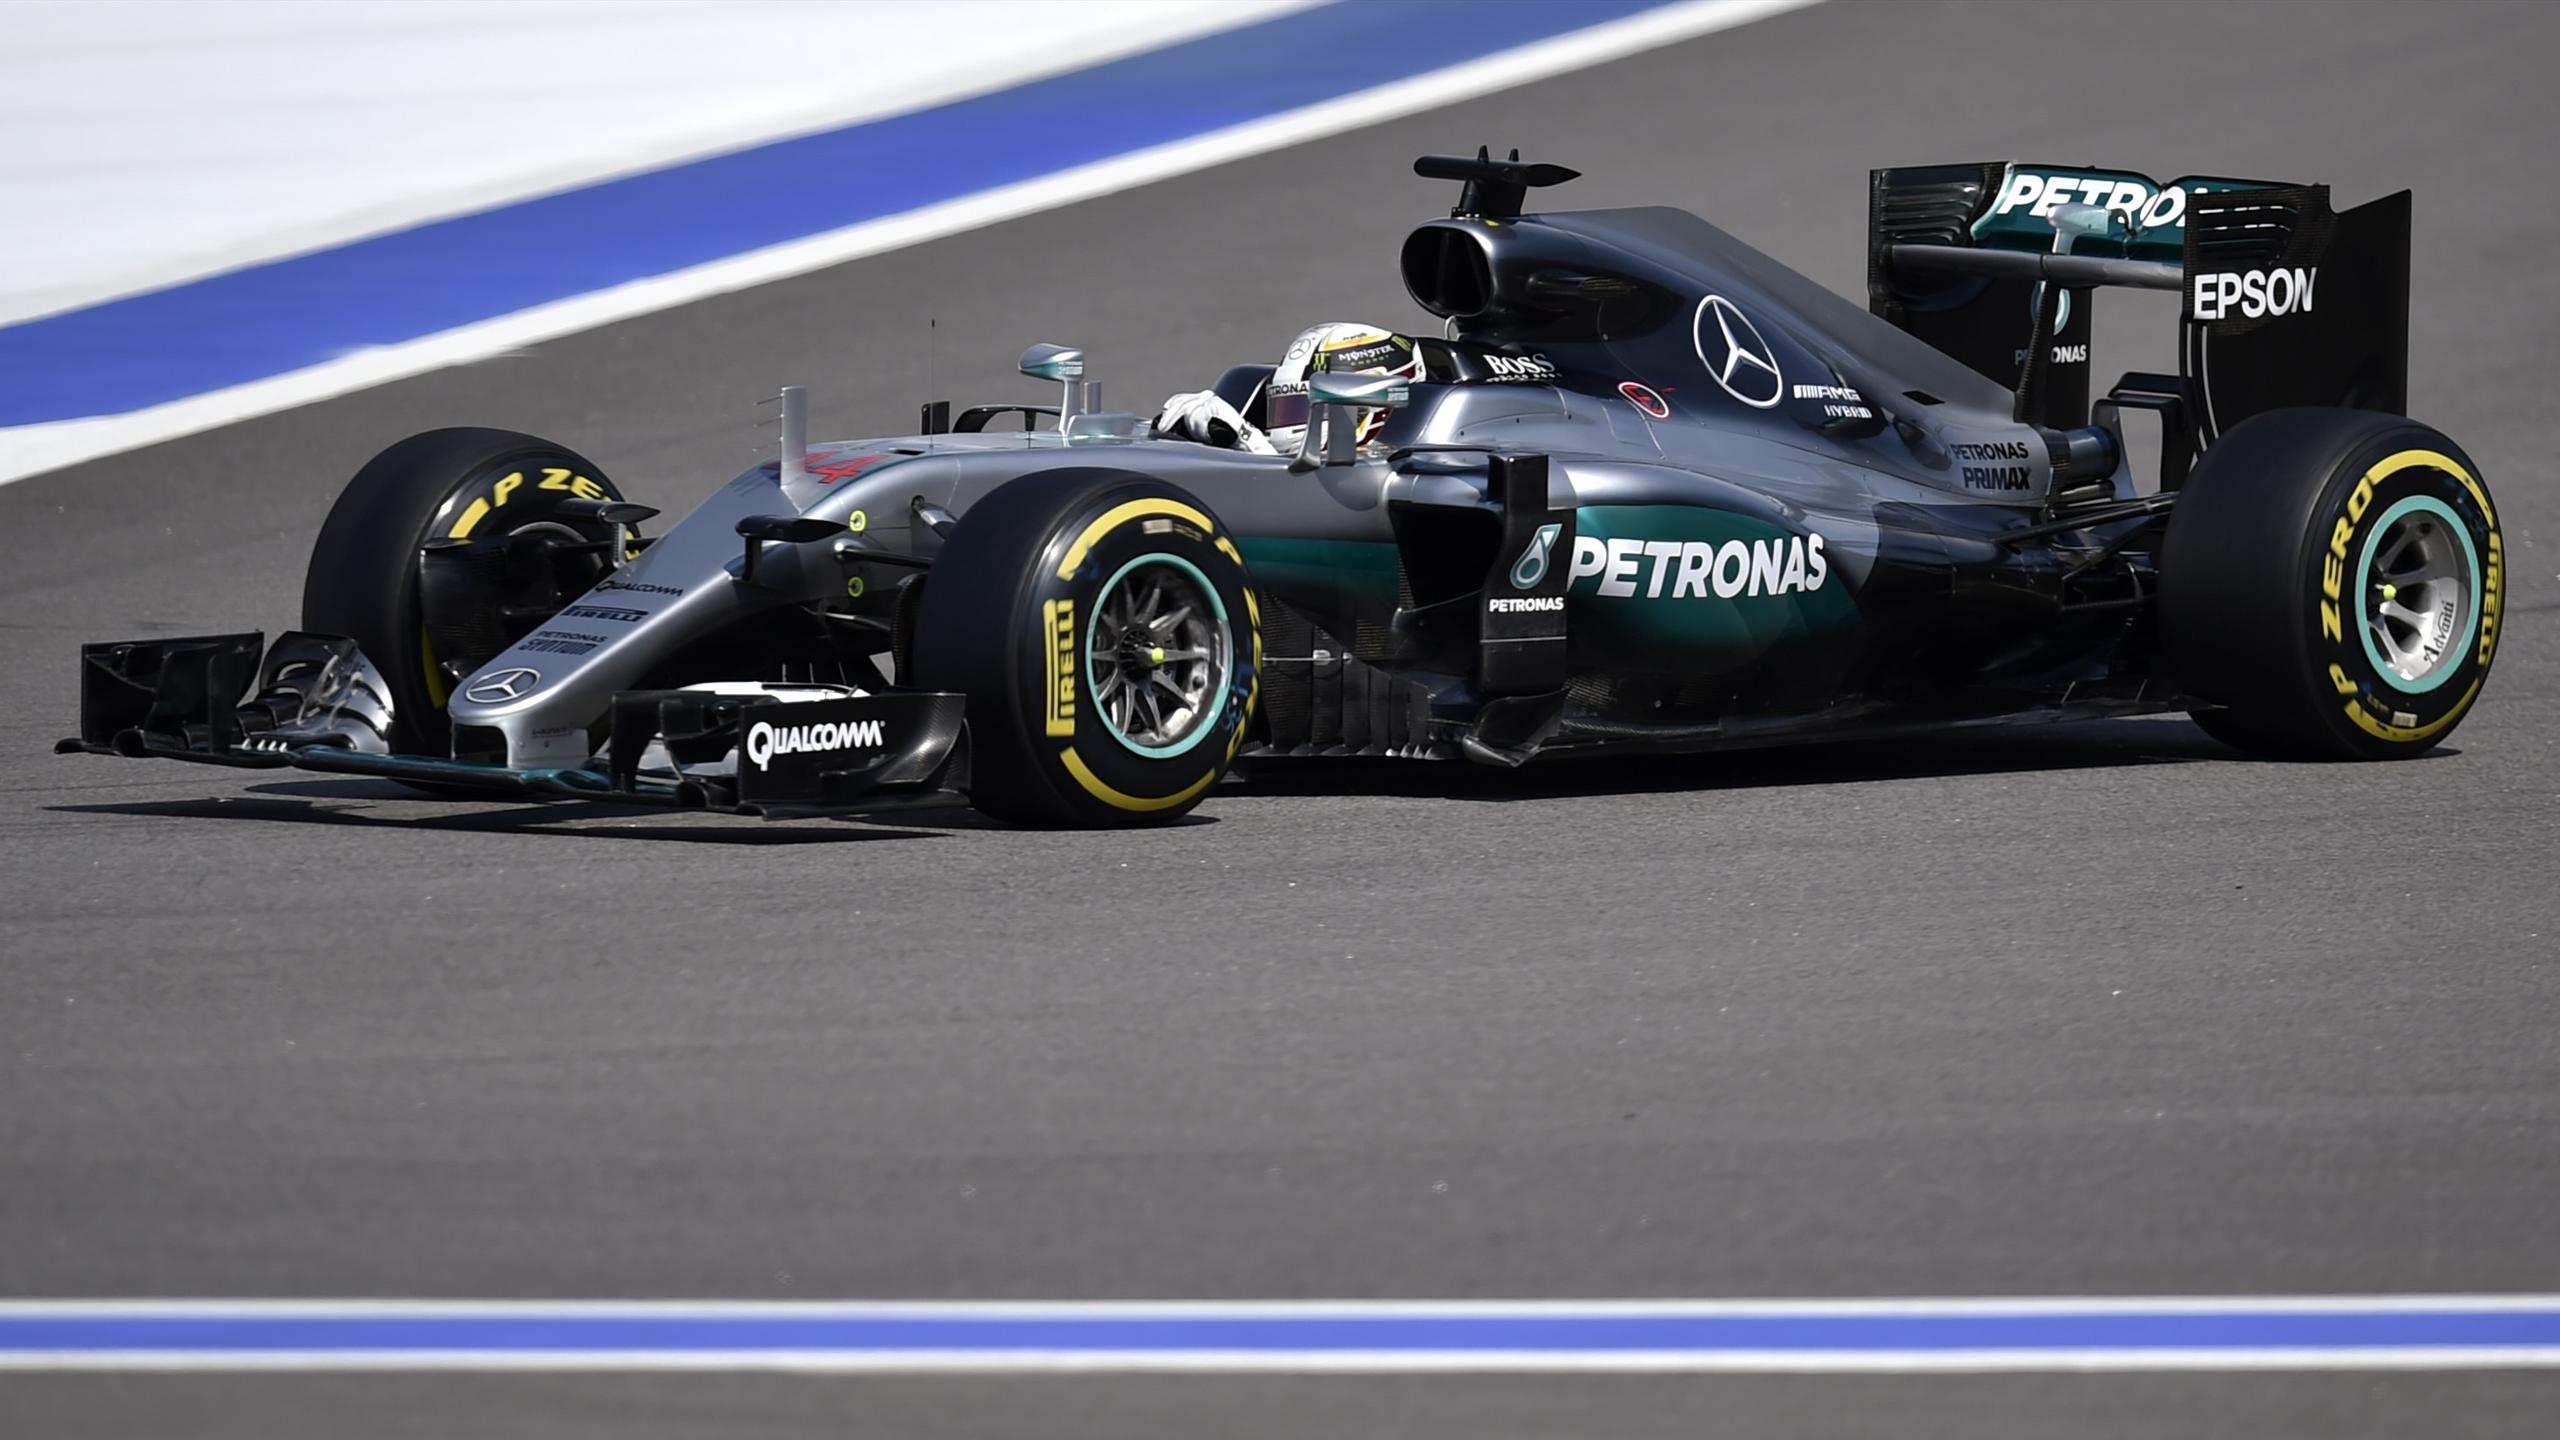 Lewis Hamilton (Mercedes) - GP of Russia 2016